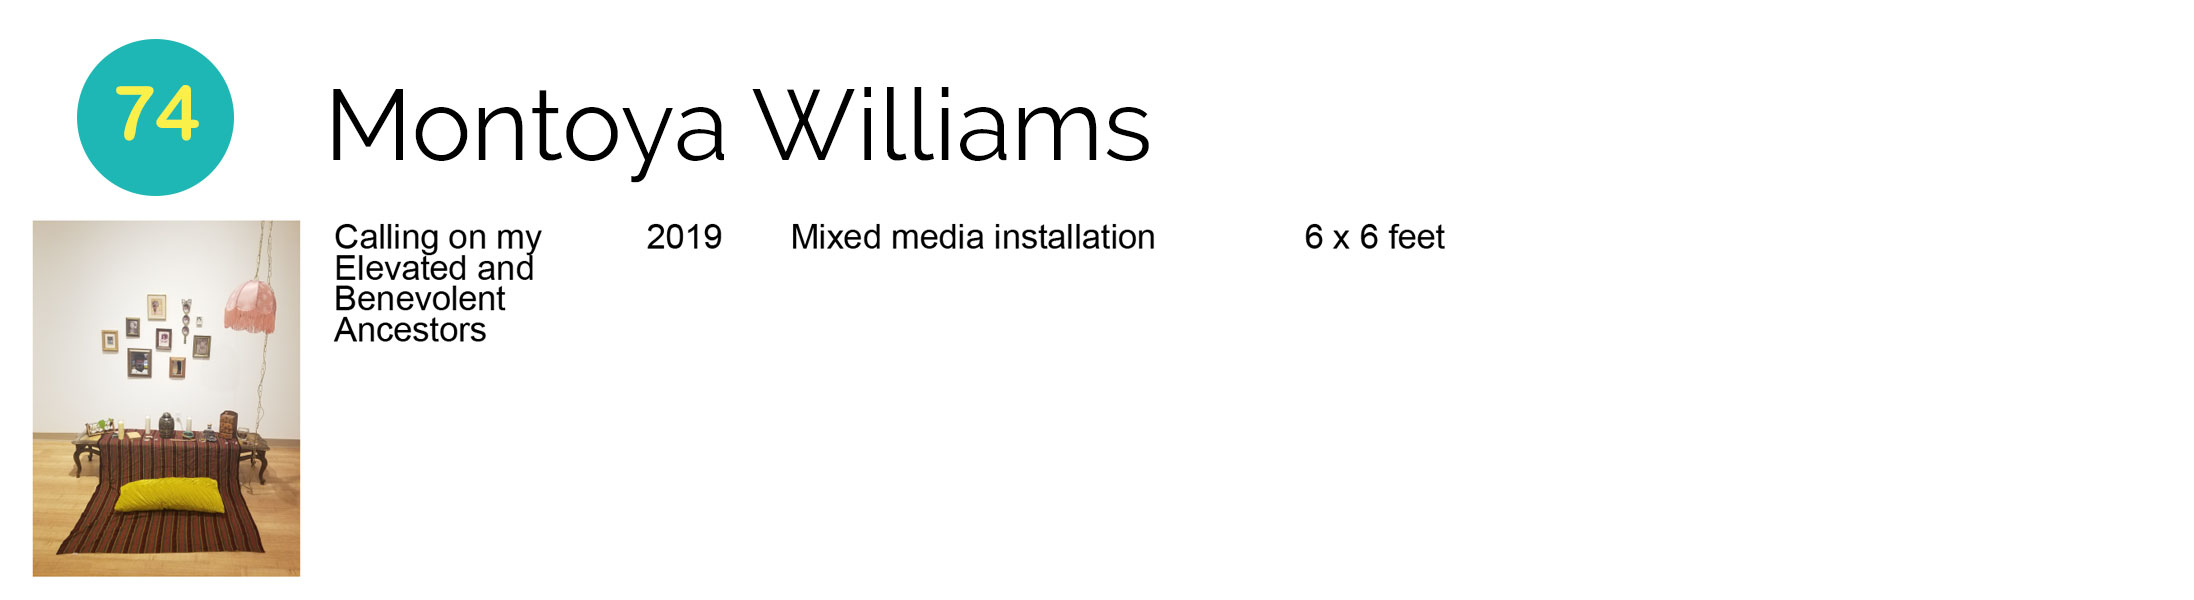 74_Williams.jpg